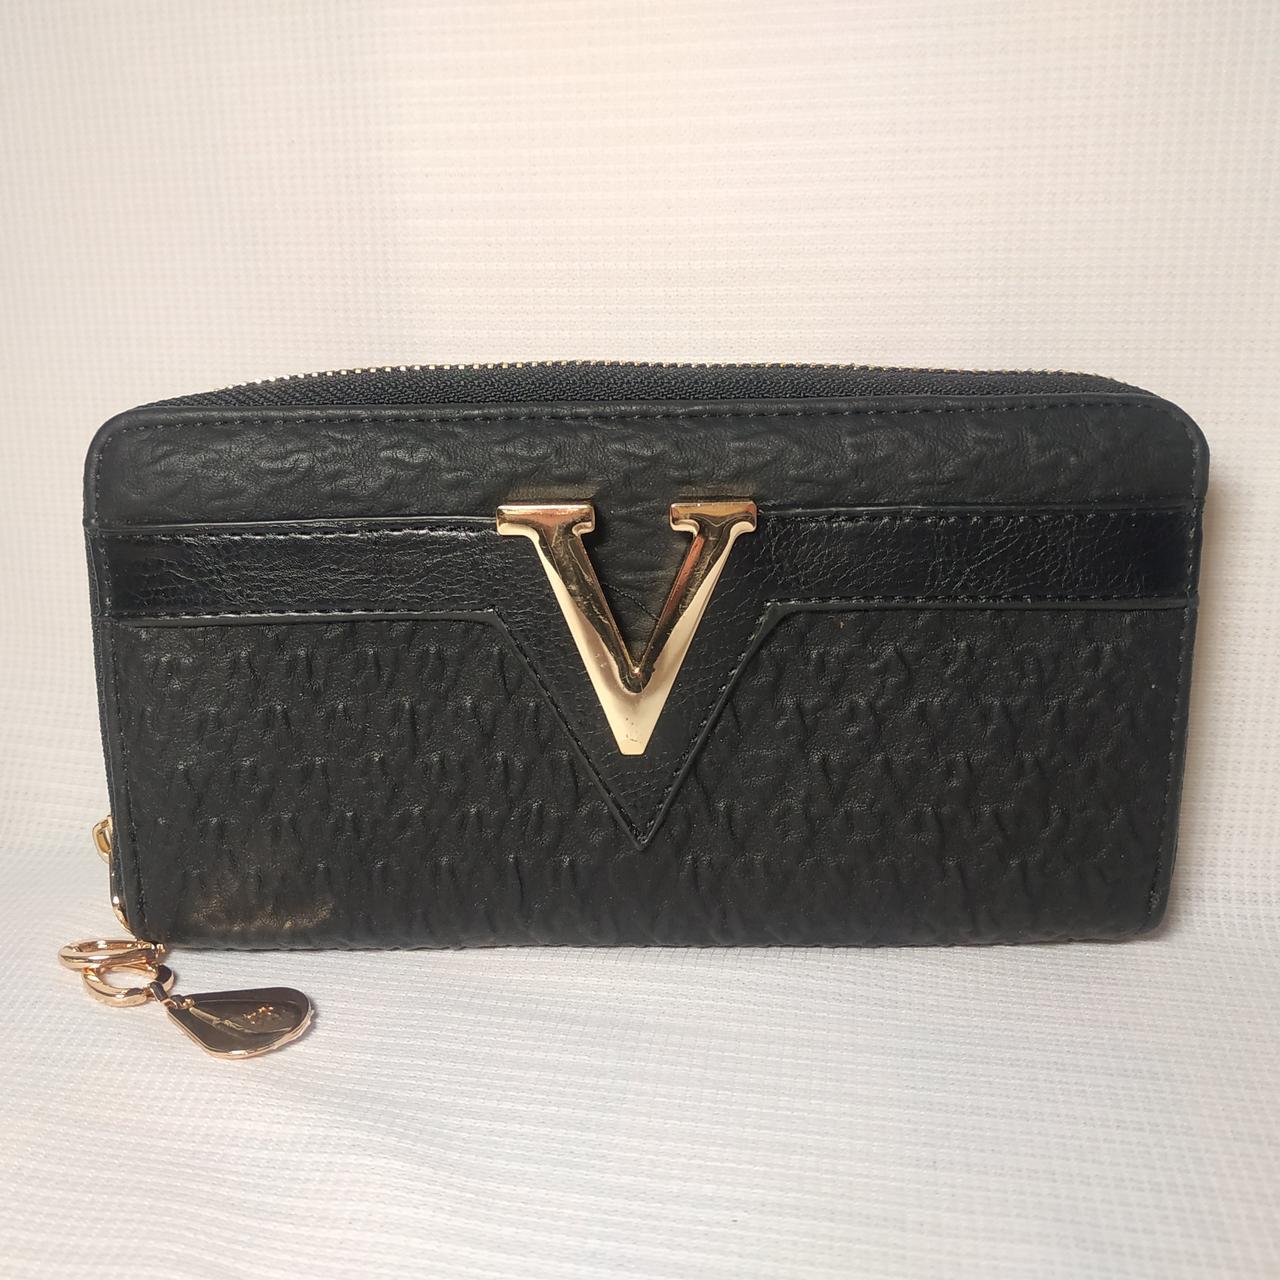 Классический женский кошелек клатч из PU кожи DBL-PU-0006